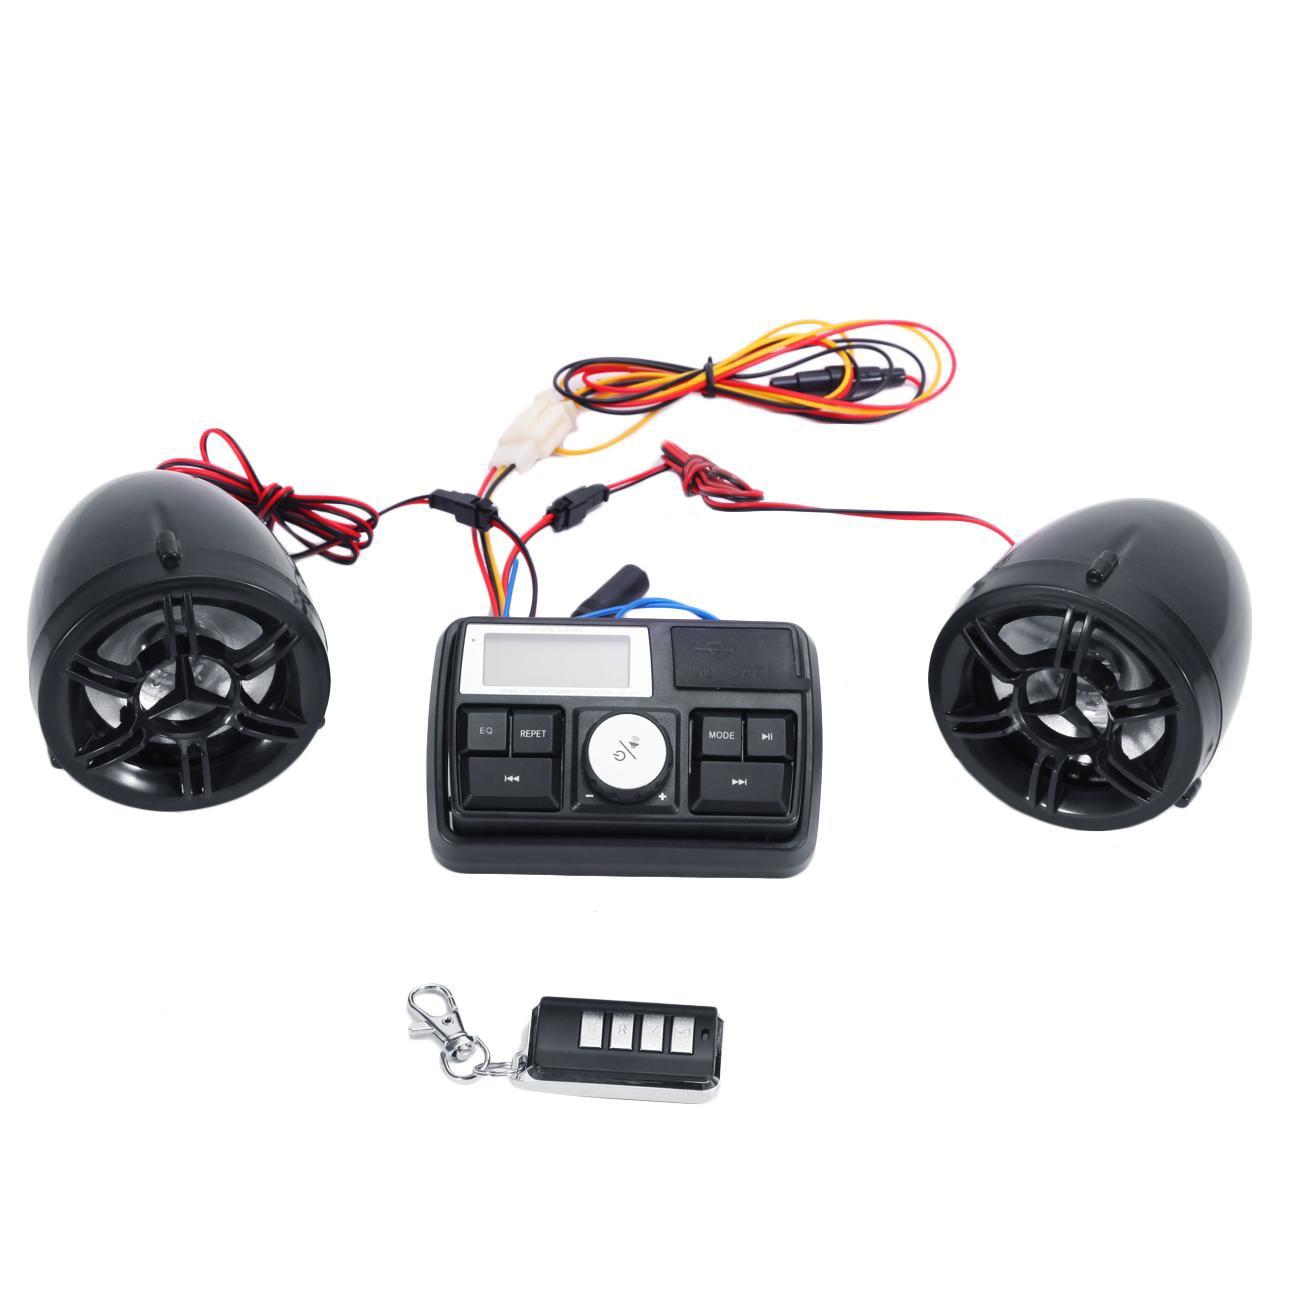 Bluetooth Waterproof 2 Speakers Practical Motorcycle Audio Set FM Radio Built In Alarm Accessories Anti Theft Outdoor LCD Screen